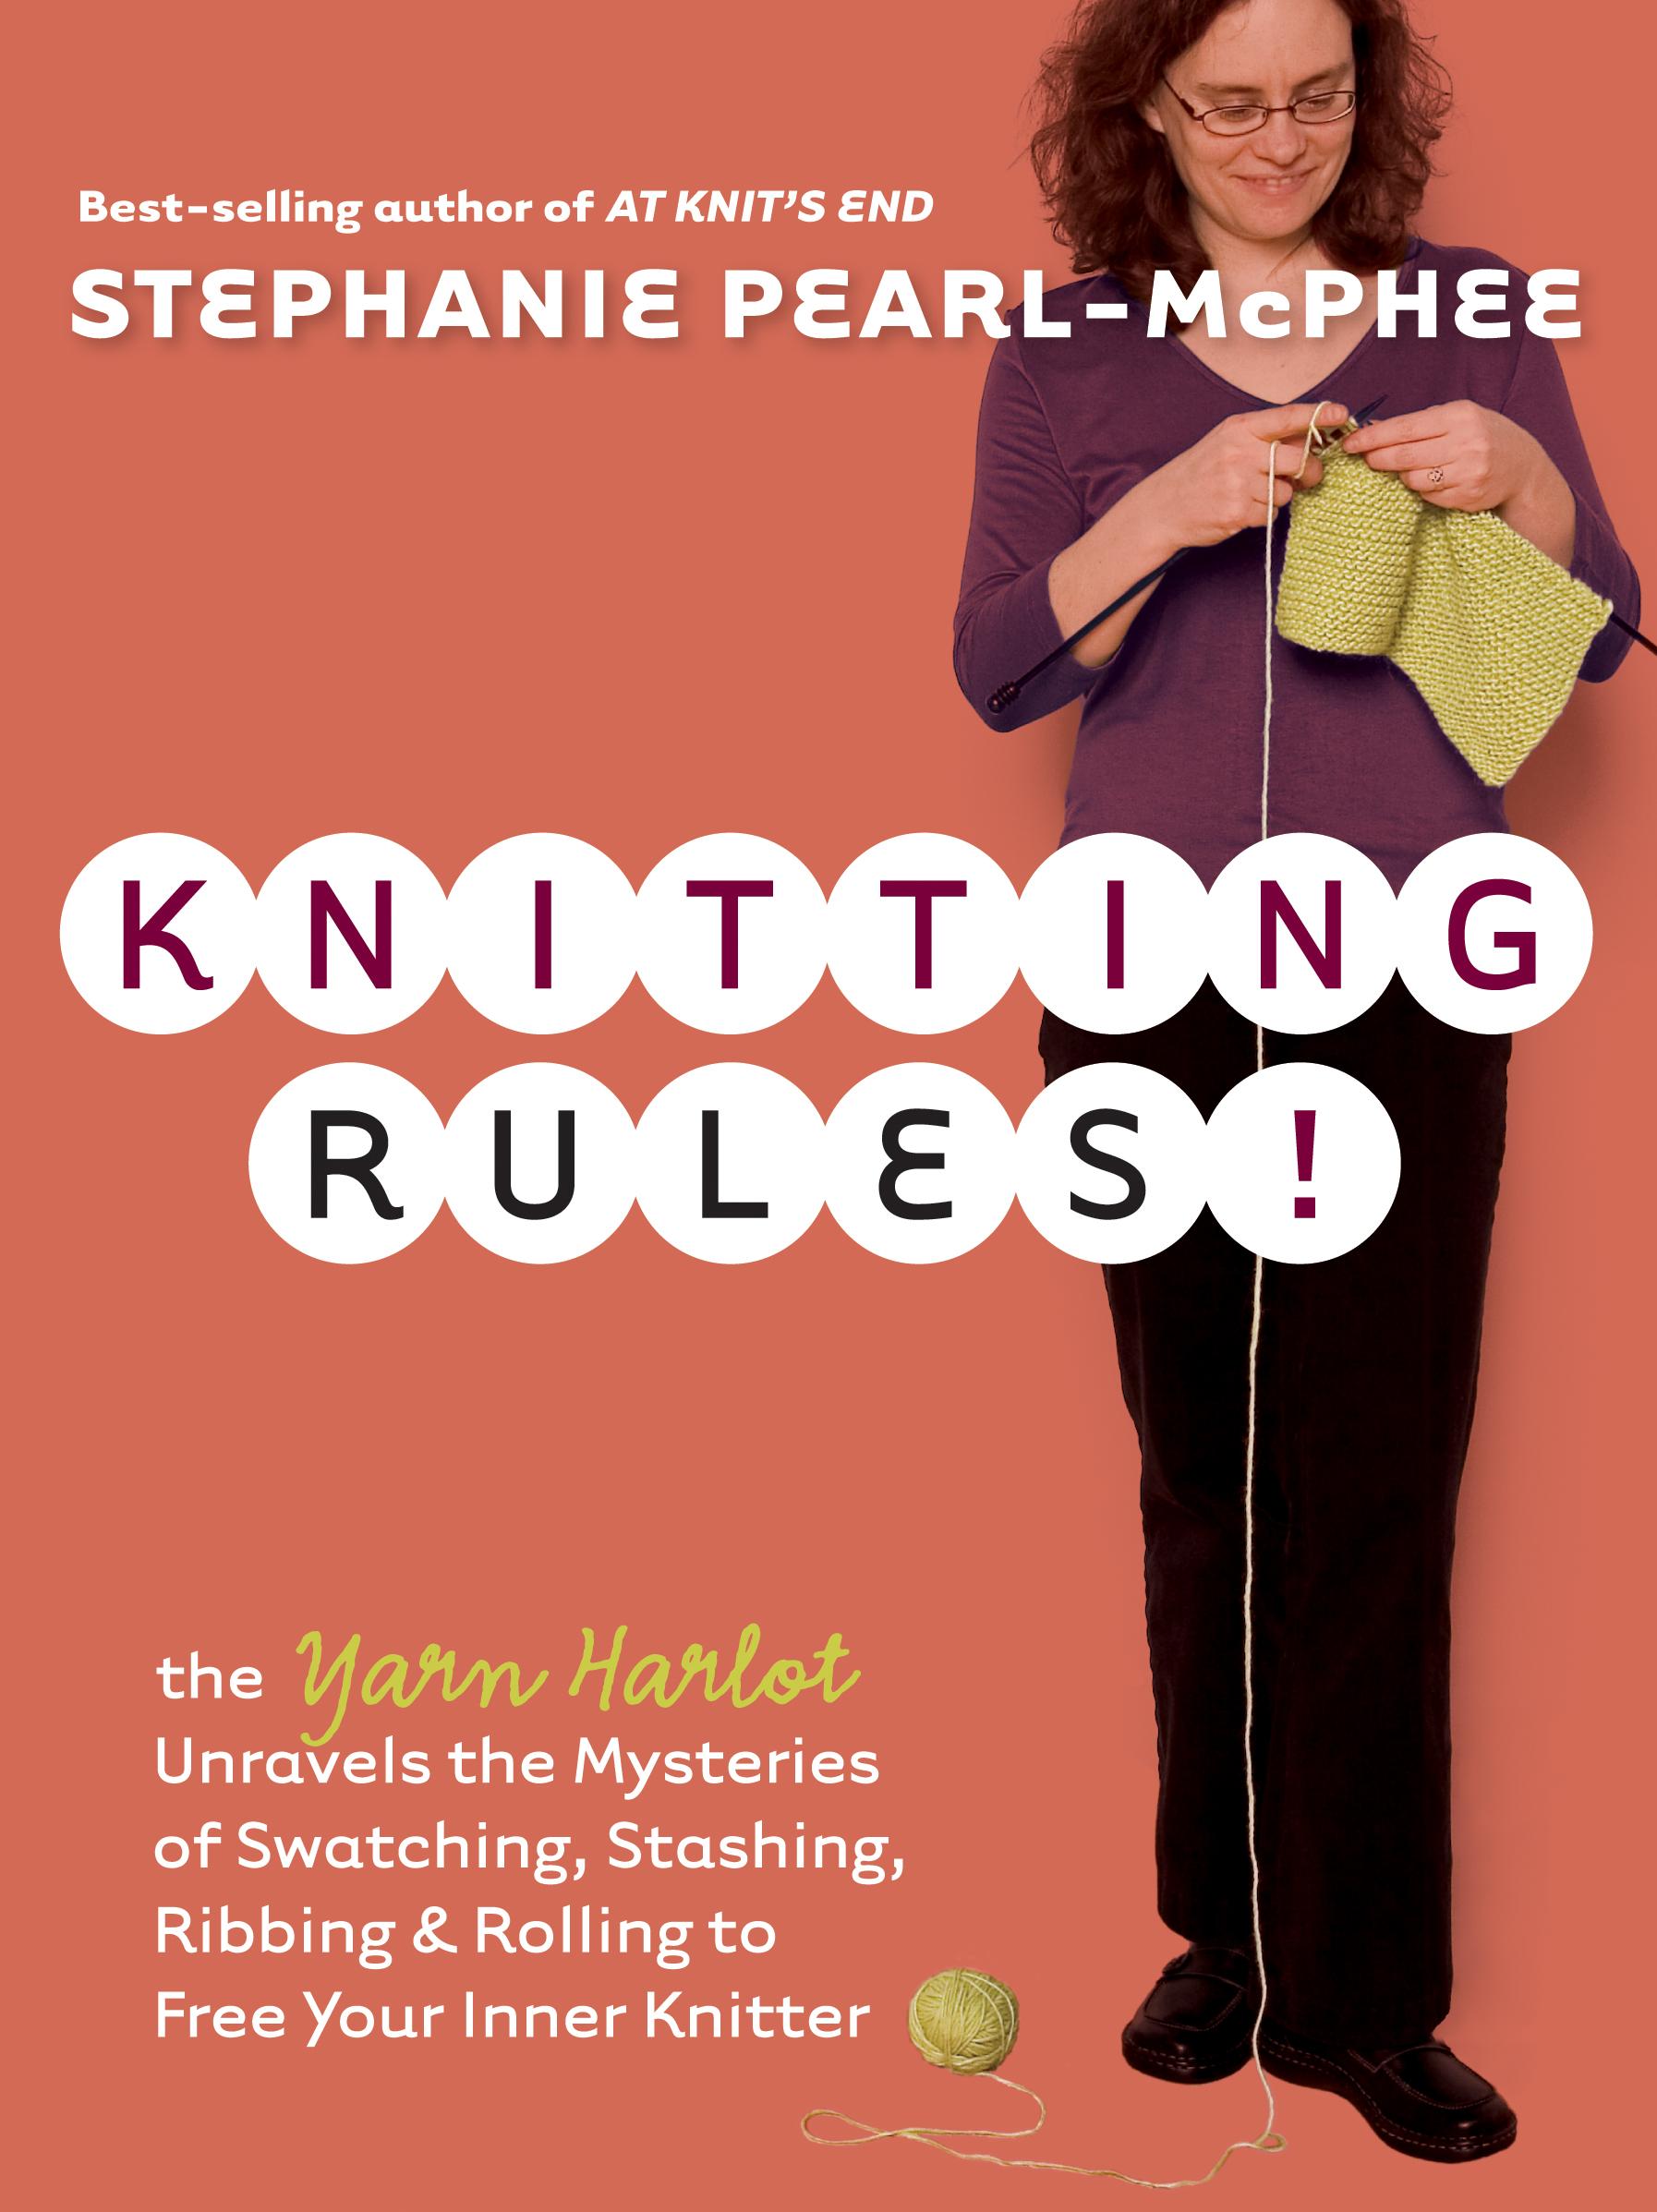 Knitting Rules! The Yarn Harlot's Bag of Knitting Tricks - Stephanie Pearl-McPhee